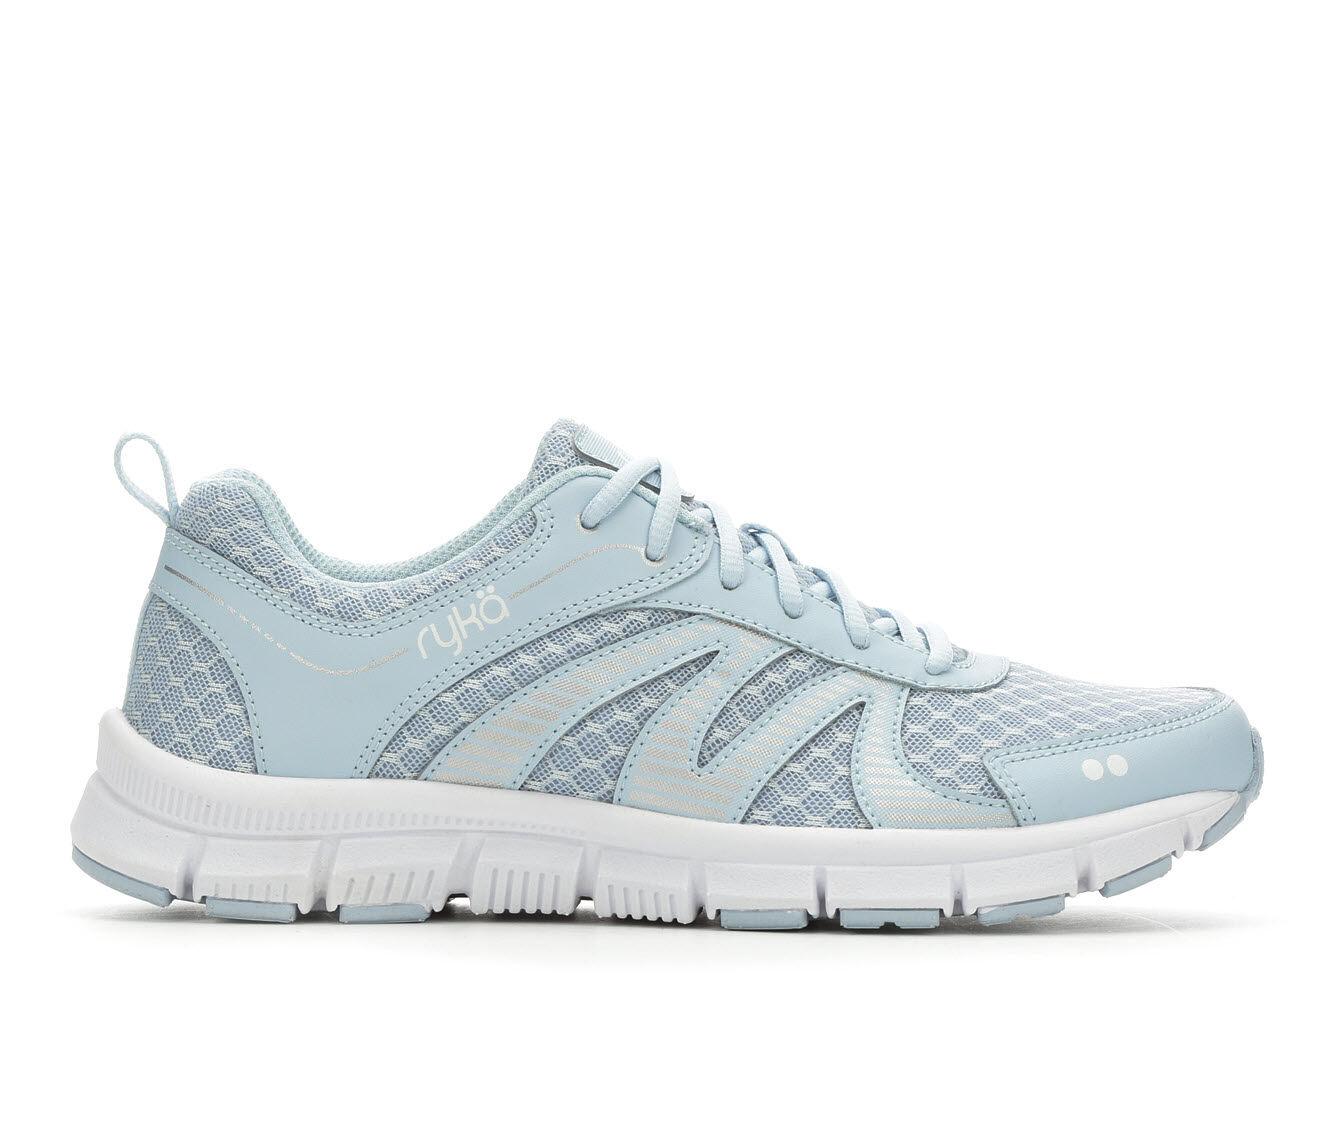 new style Women's Ryka Heather Training Shoes Soft Blue/White